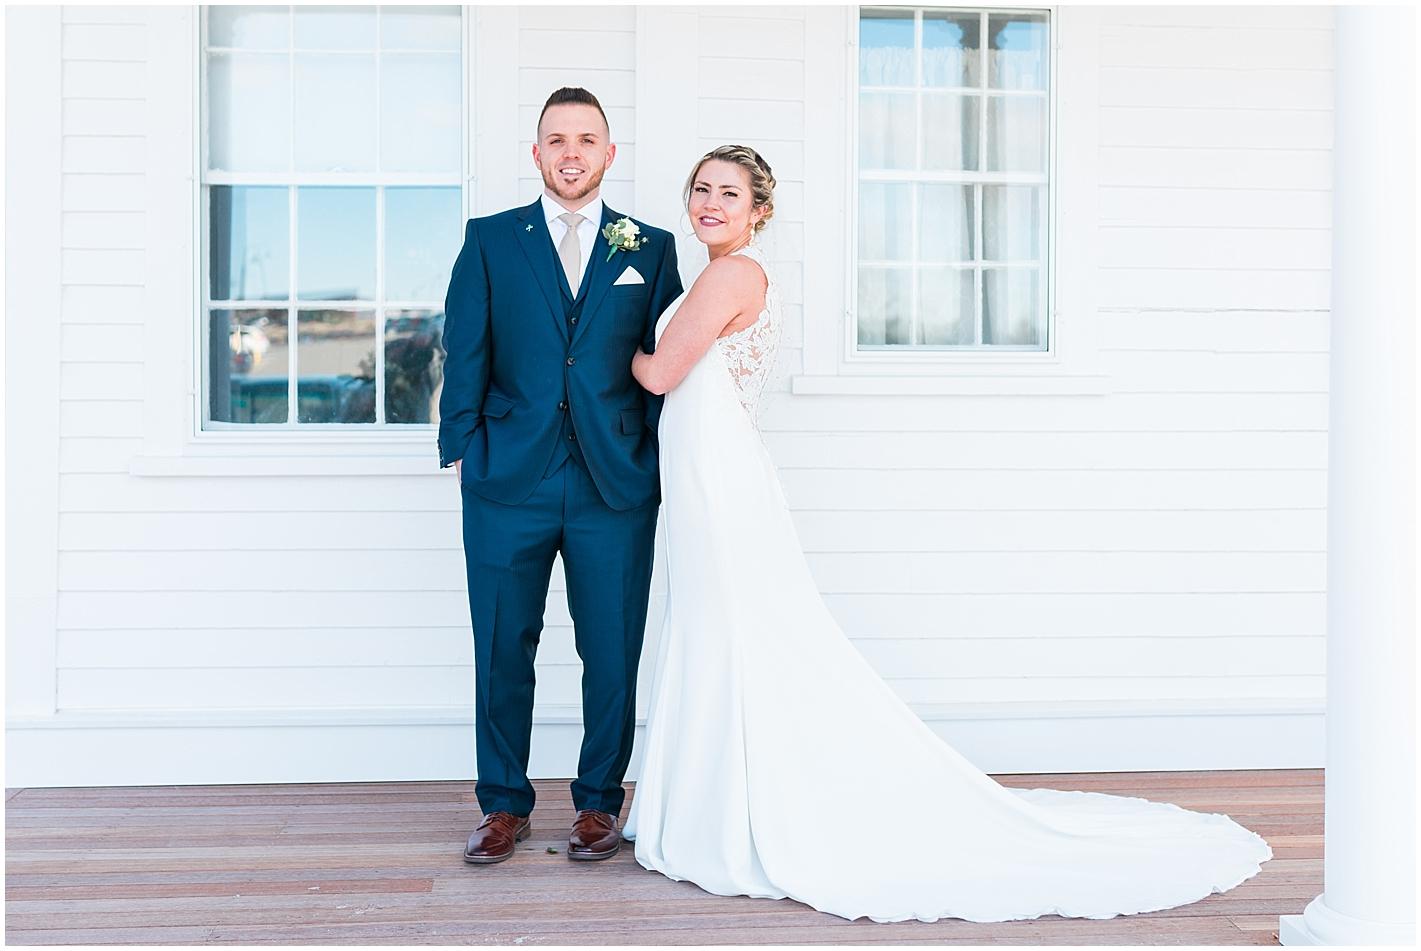 Groton Wedding Photographer Photos by Alyssa Parker Photography